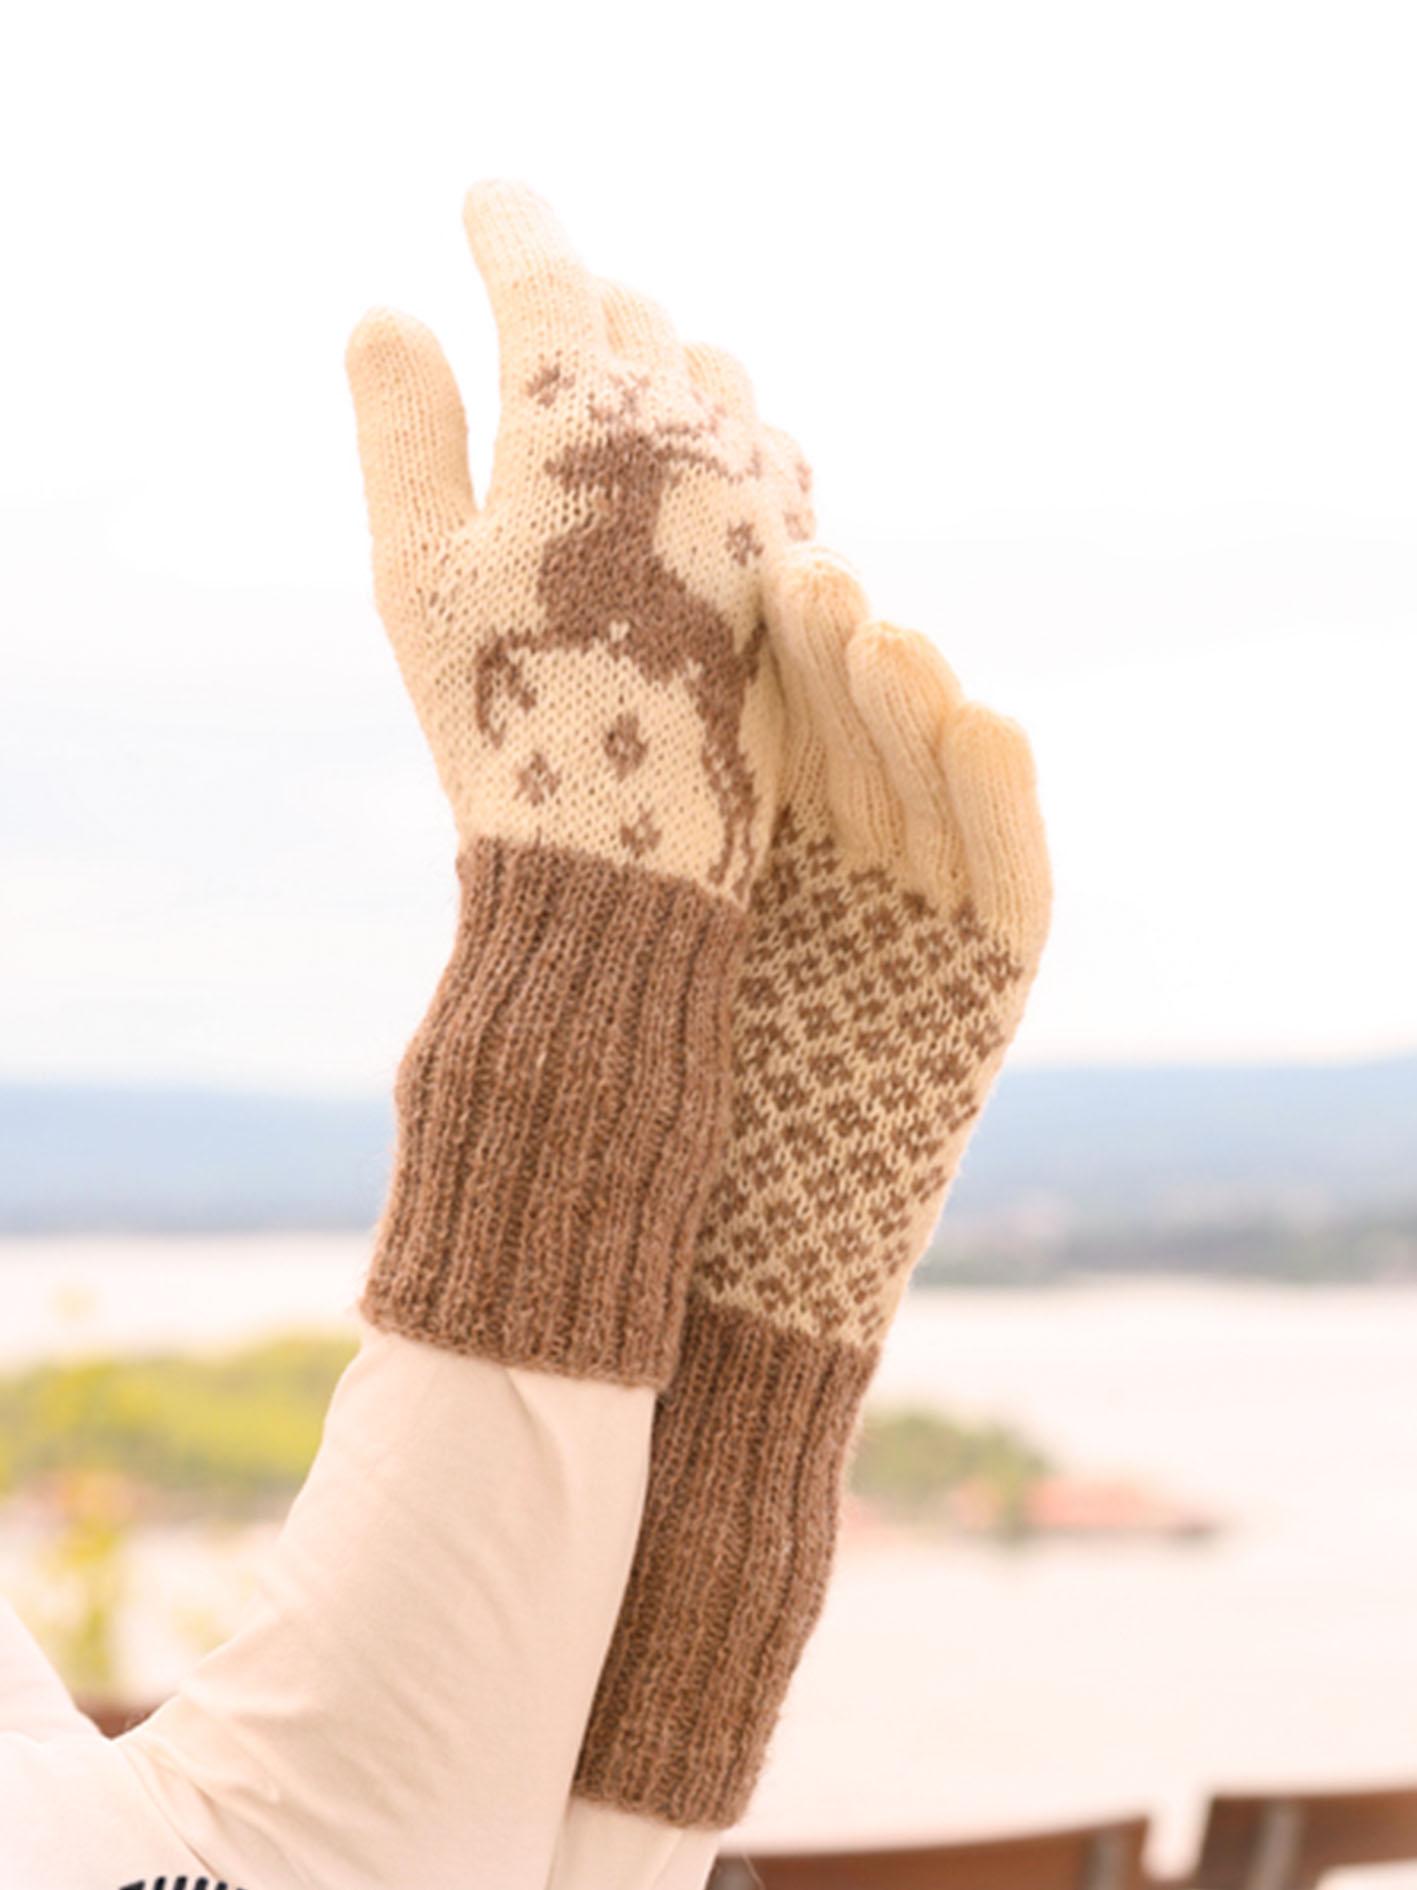 crochet-dedo-e-fingerless-meio-dedo-padrao-de-luva